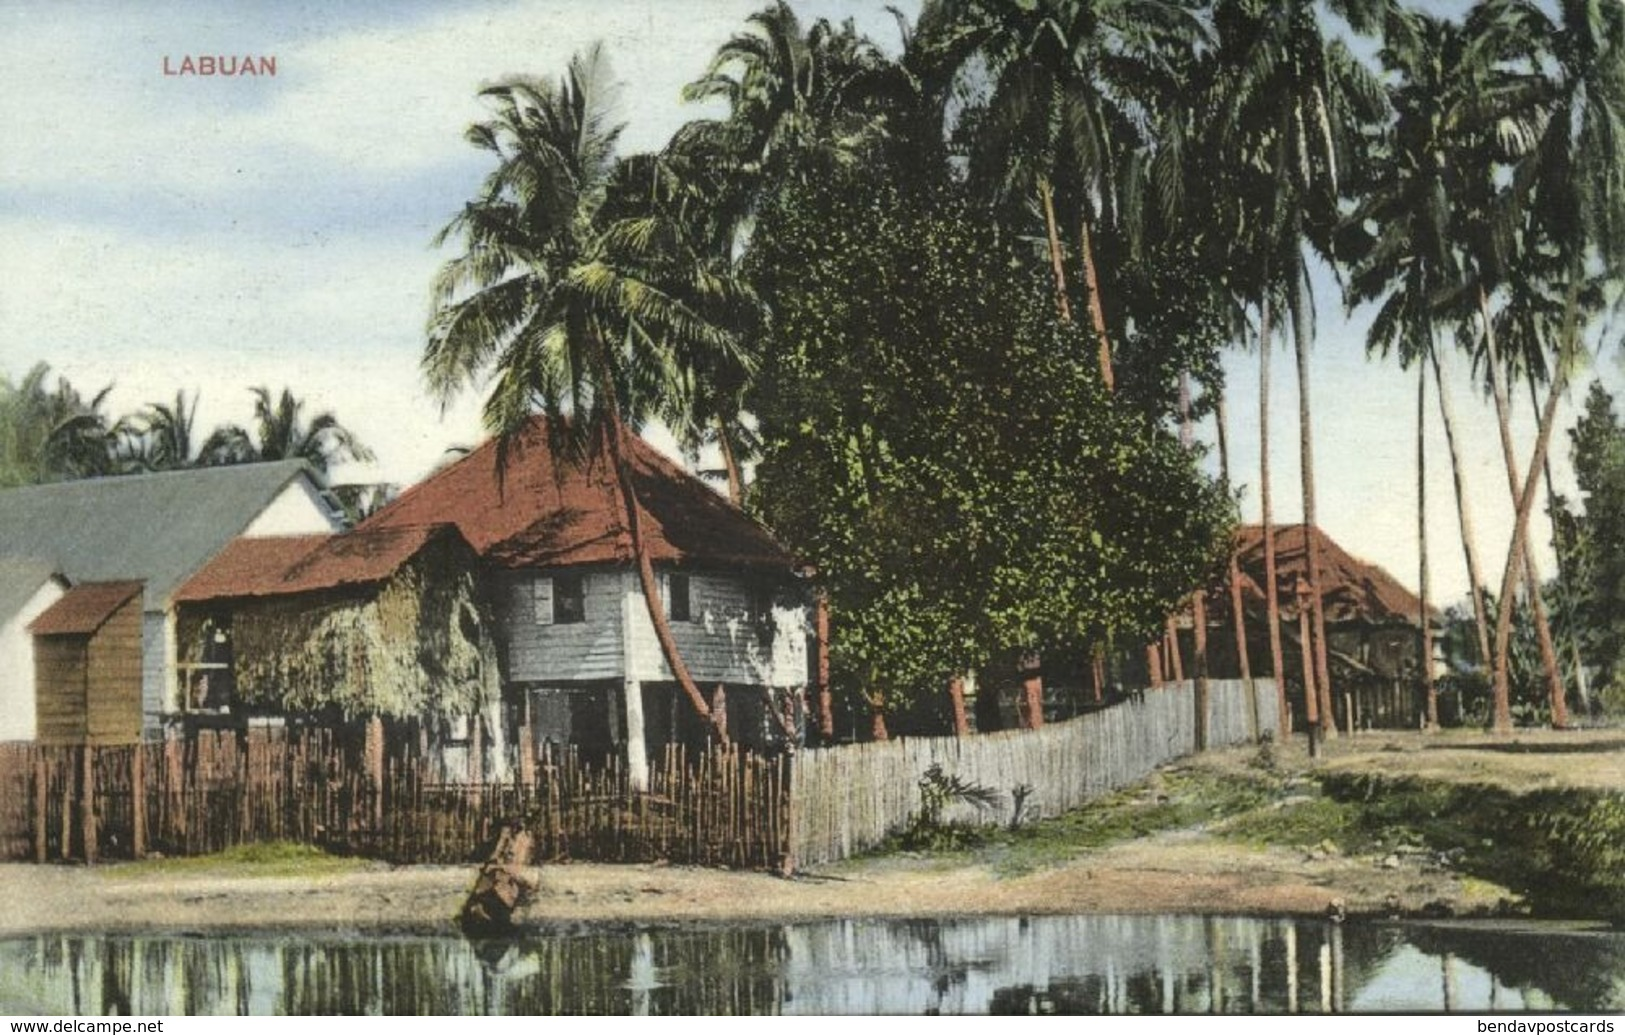 Malay Malaysia, LABUAN BORNEO, Native Houses (1910s) Postcard - Malaysia